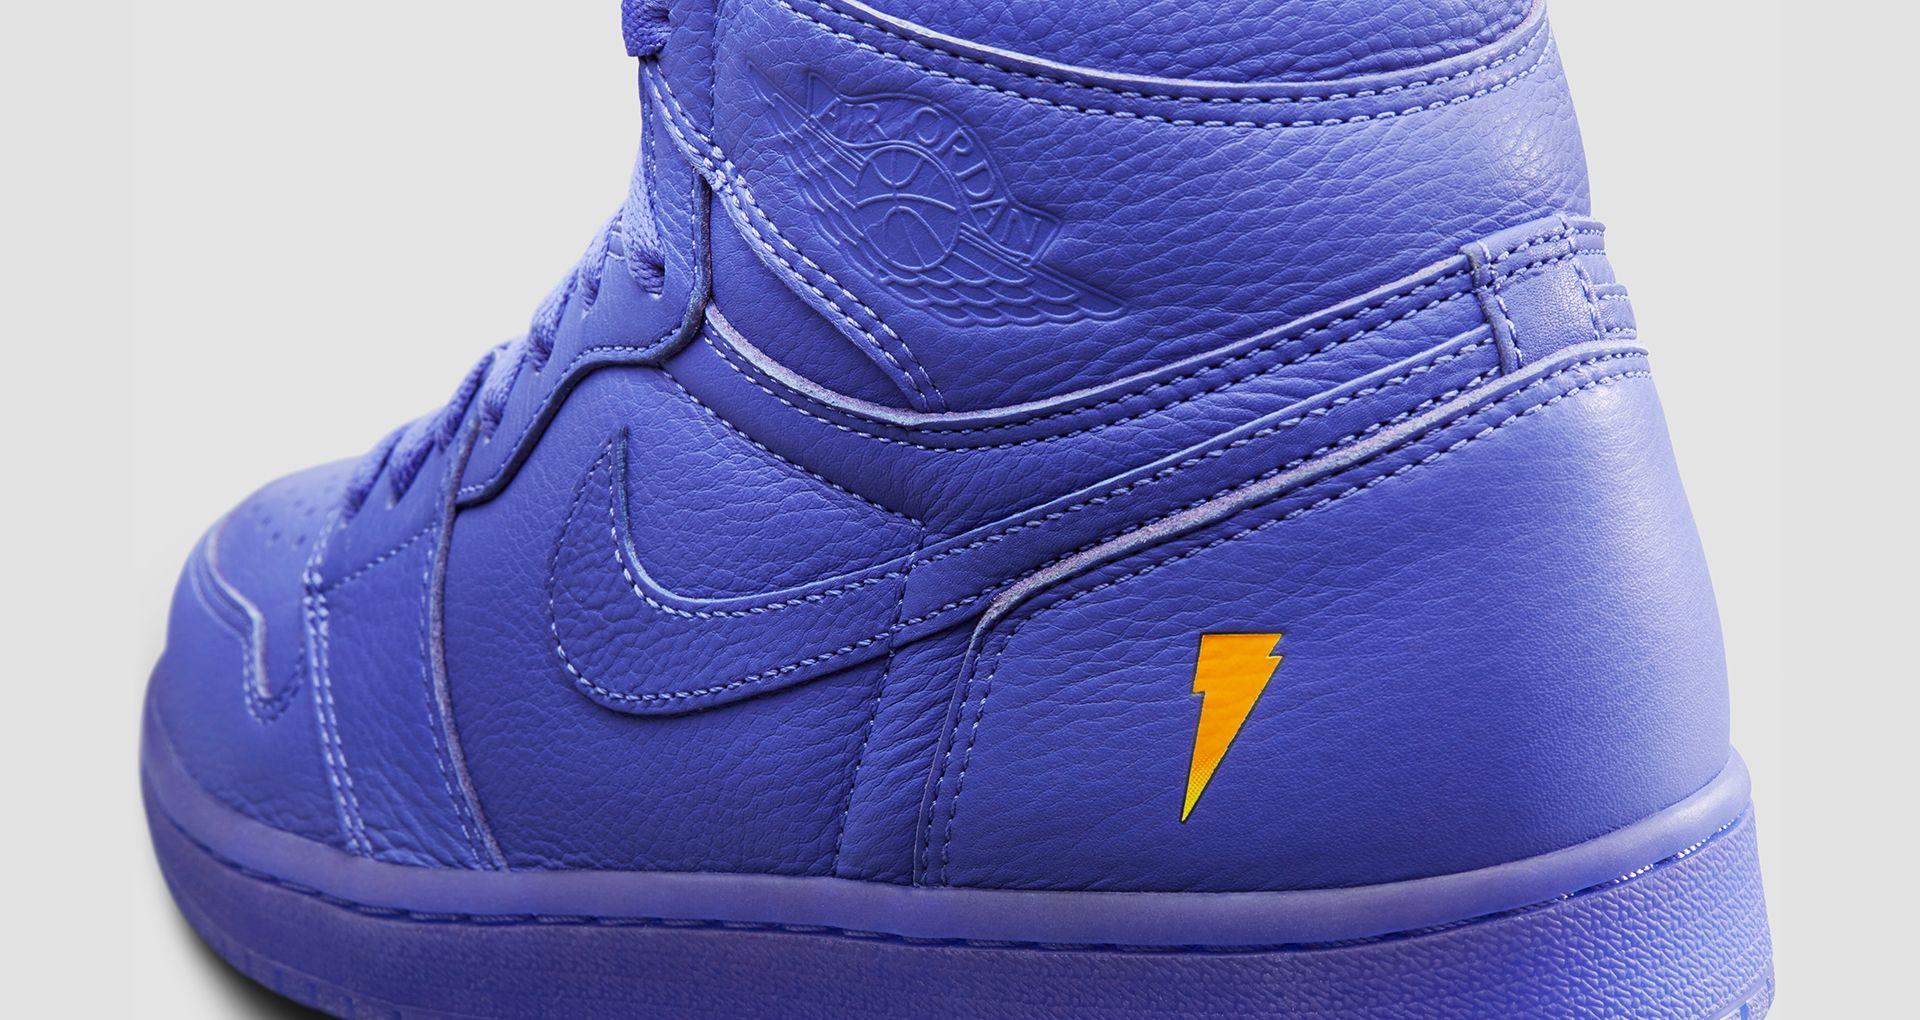 a9fc23af1b1c Behind The Design  Air Jordan 1 Gatorade  Grape . Nike+ SNKRS